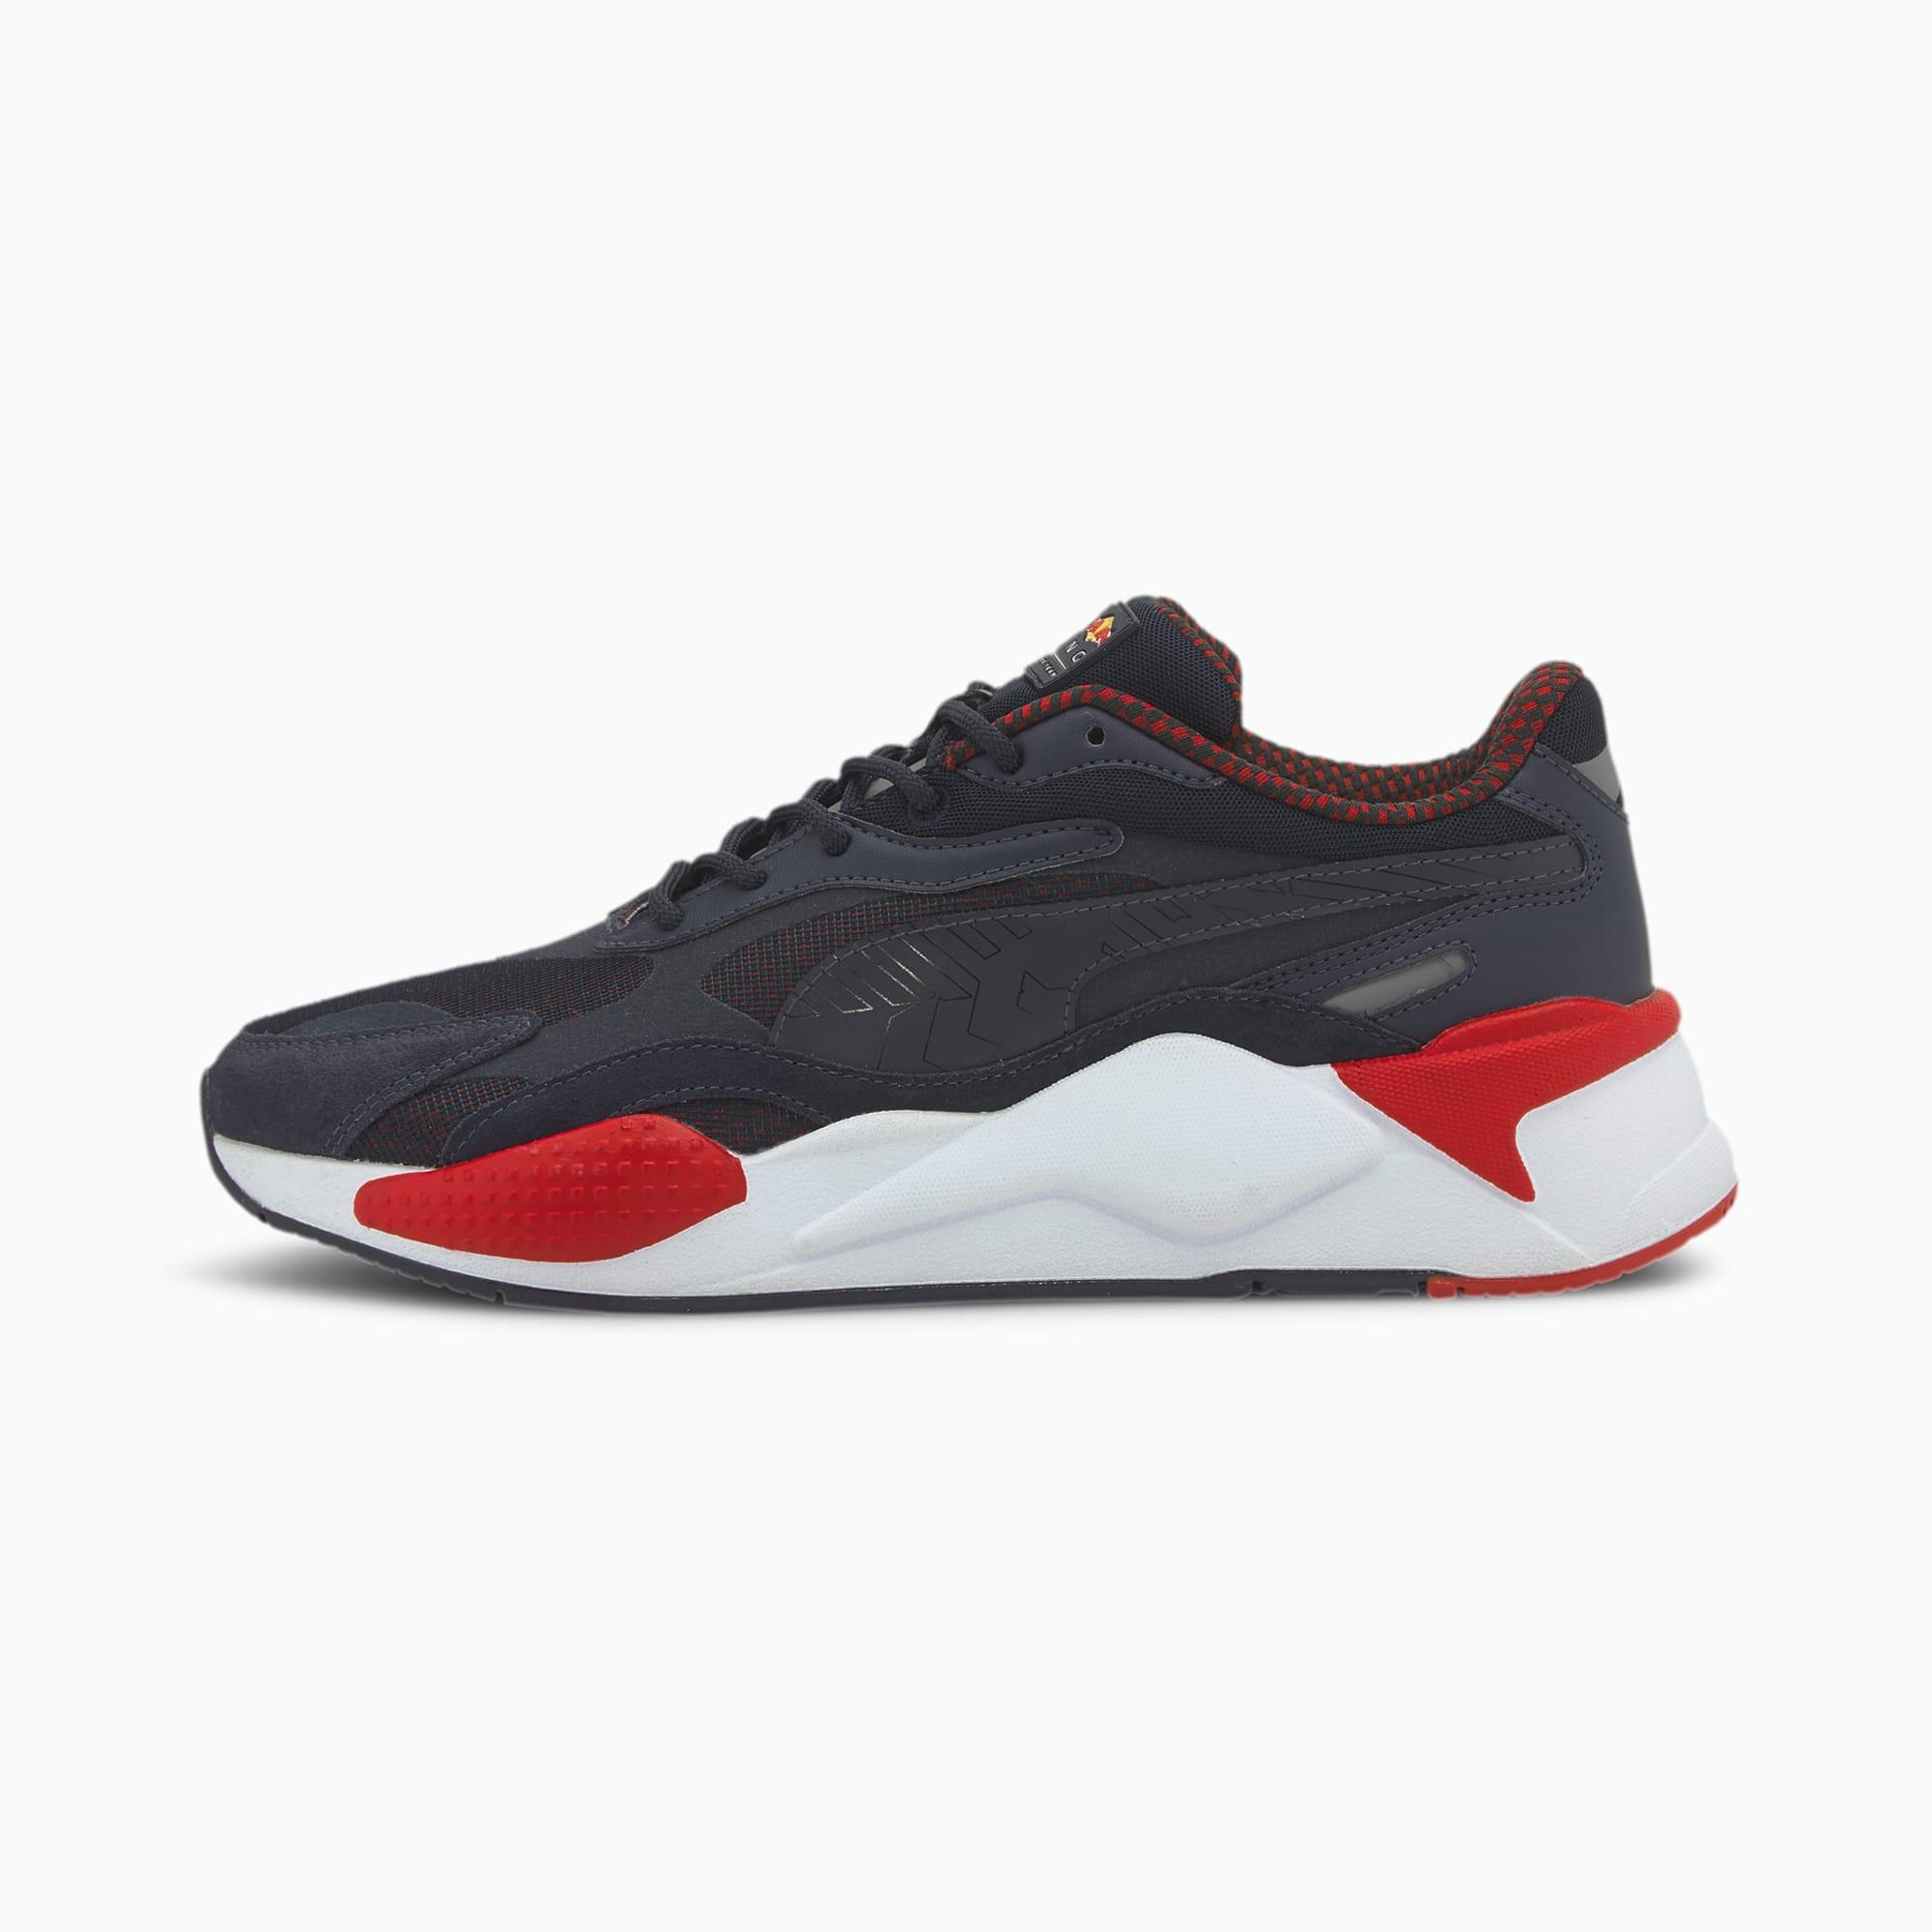 PUMA Red Bull Racing RS-X Sneaker Schuhe | Mit Aucun | Schwarz/Rot/Weiß | Größe: 42.5